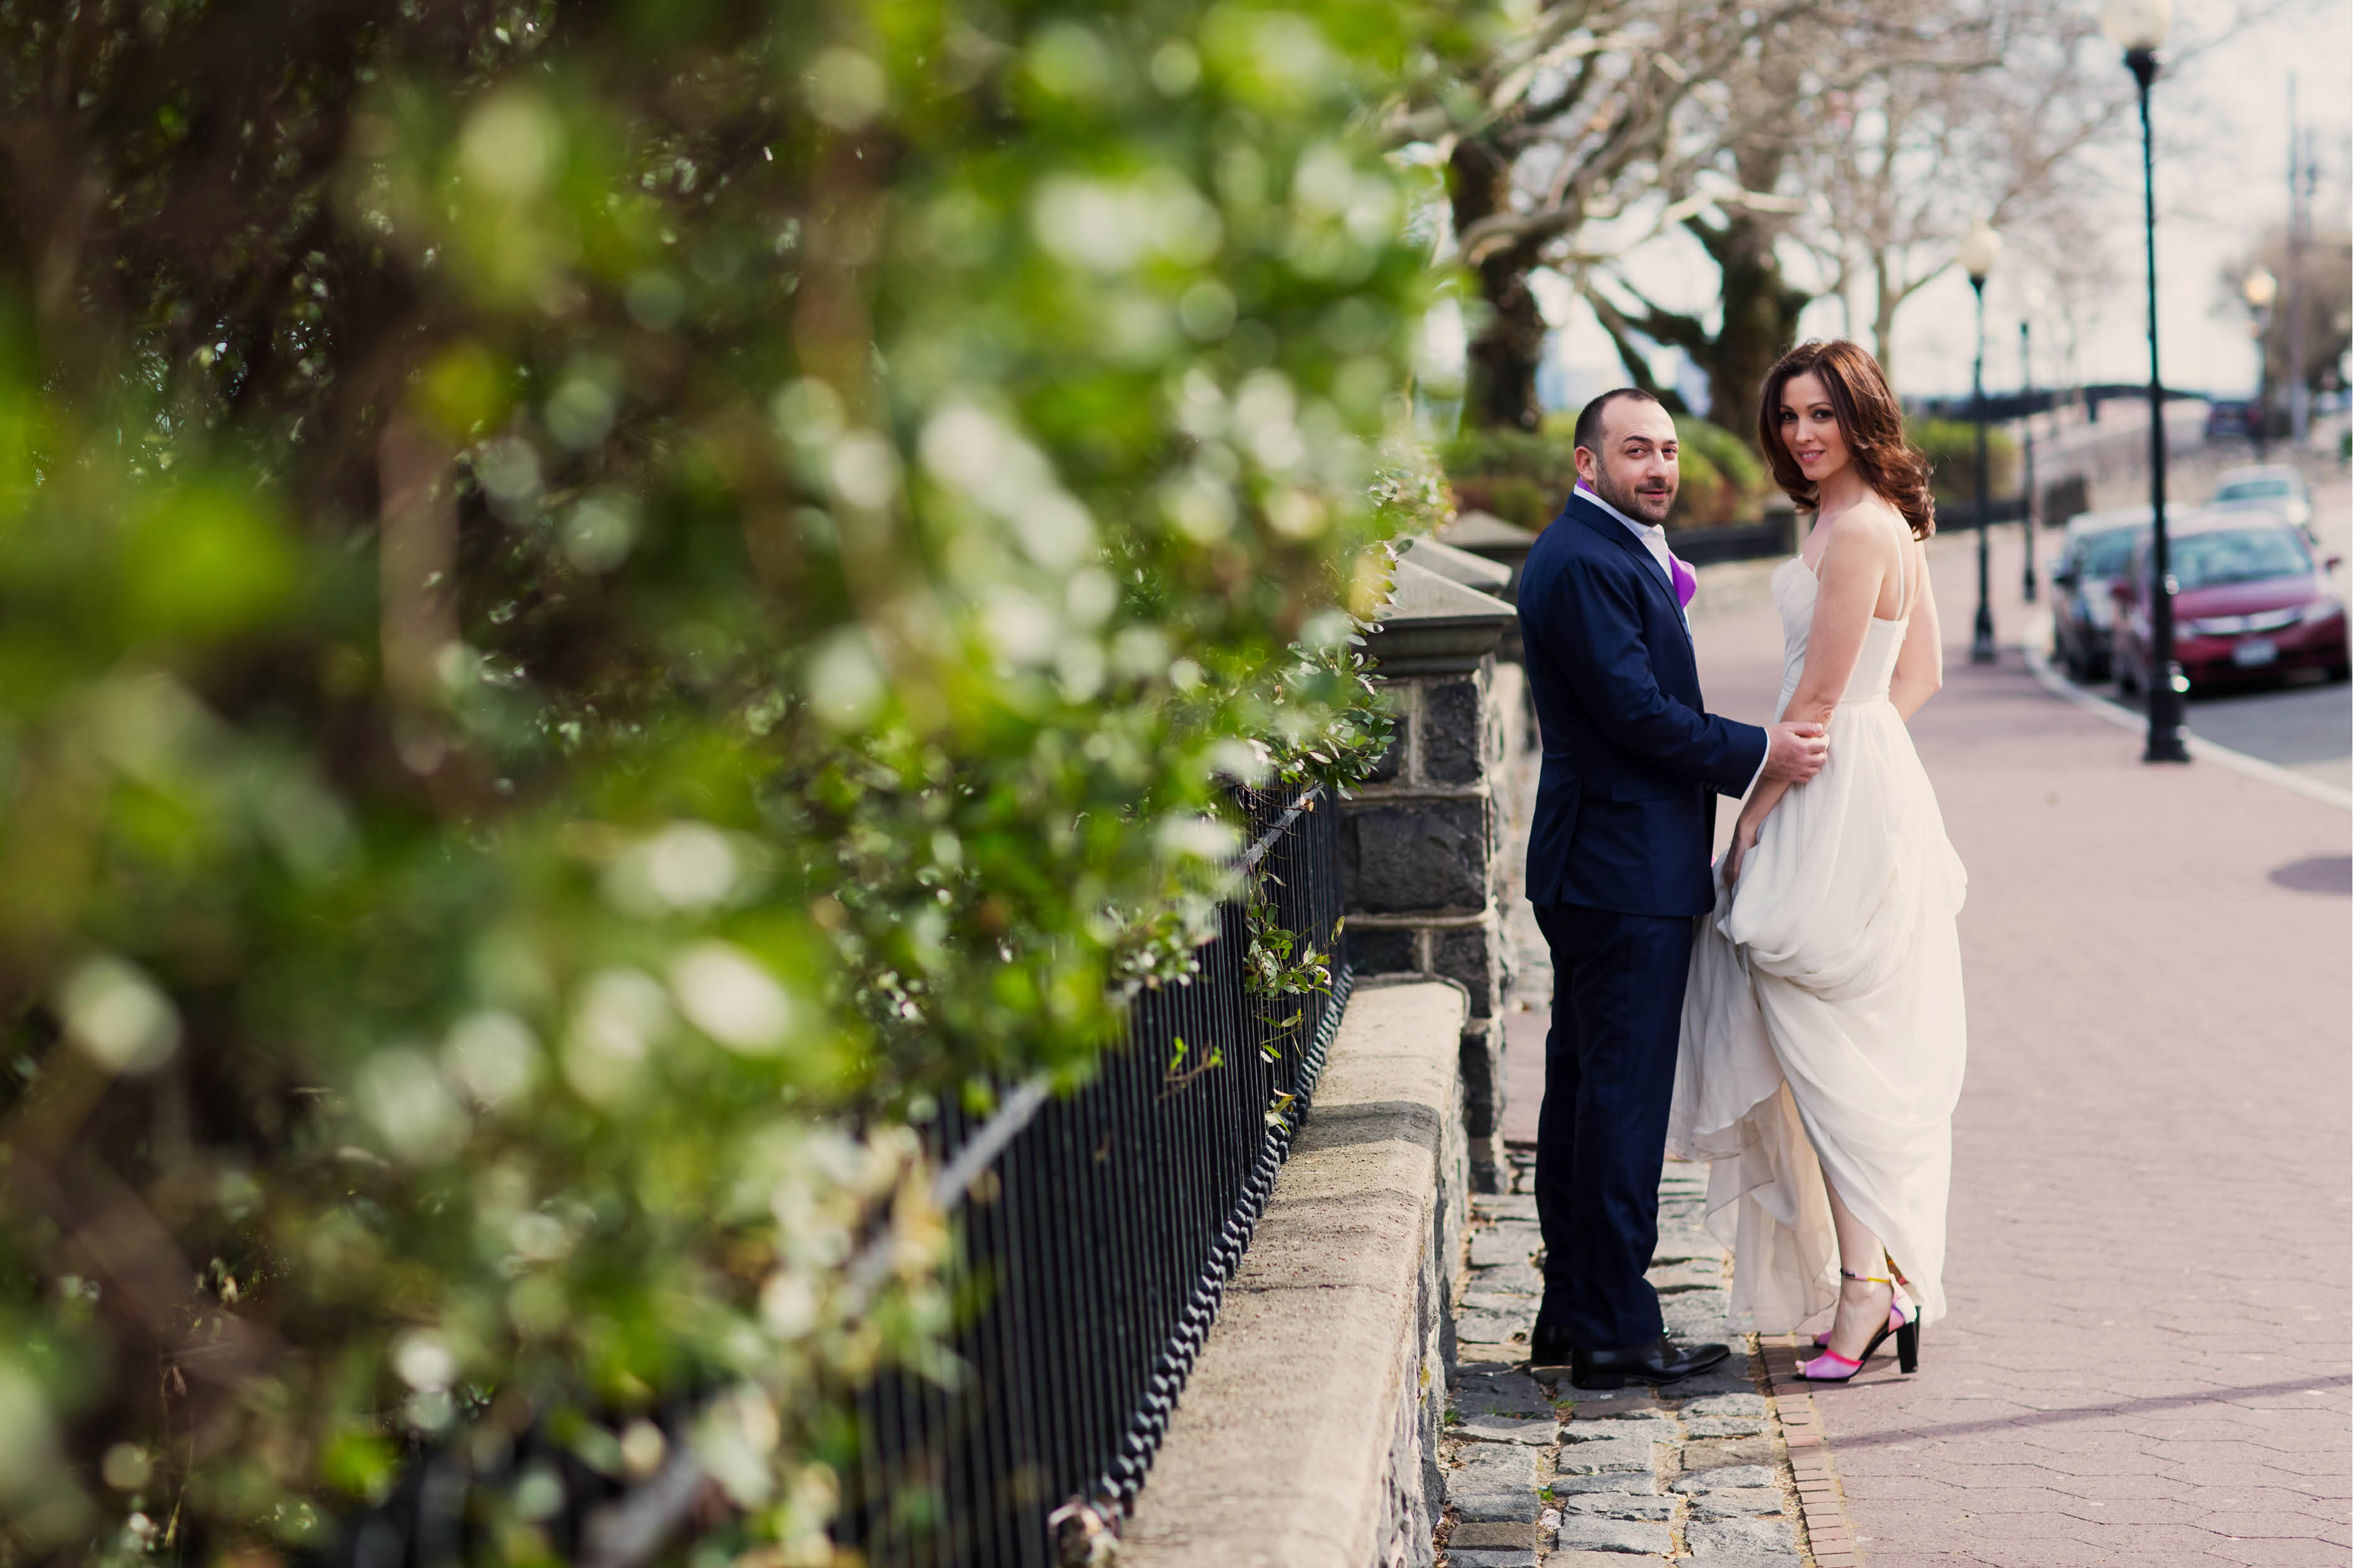 Emma_cleary_ photography_Waterside NJ wedding5